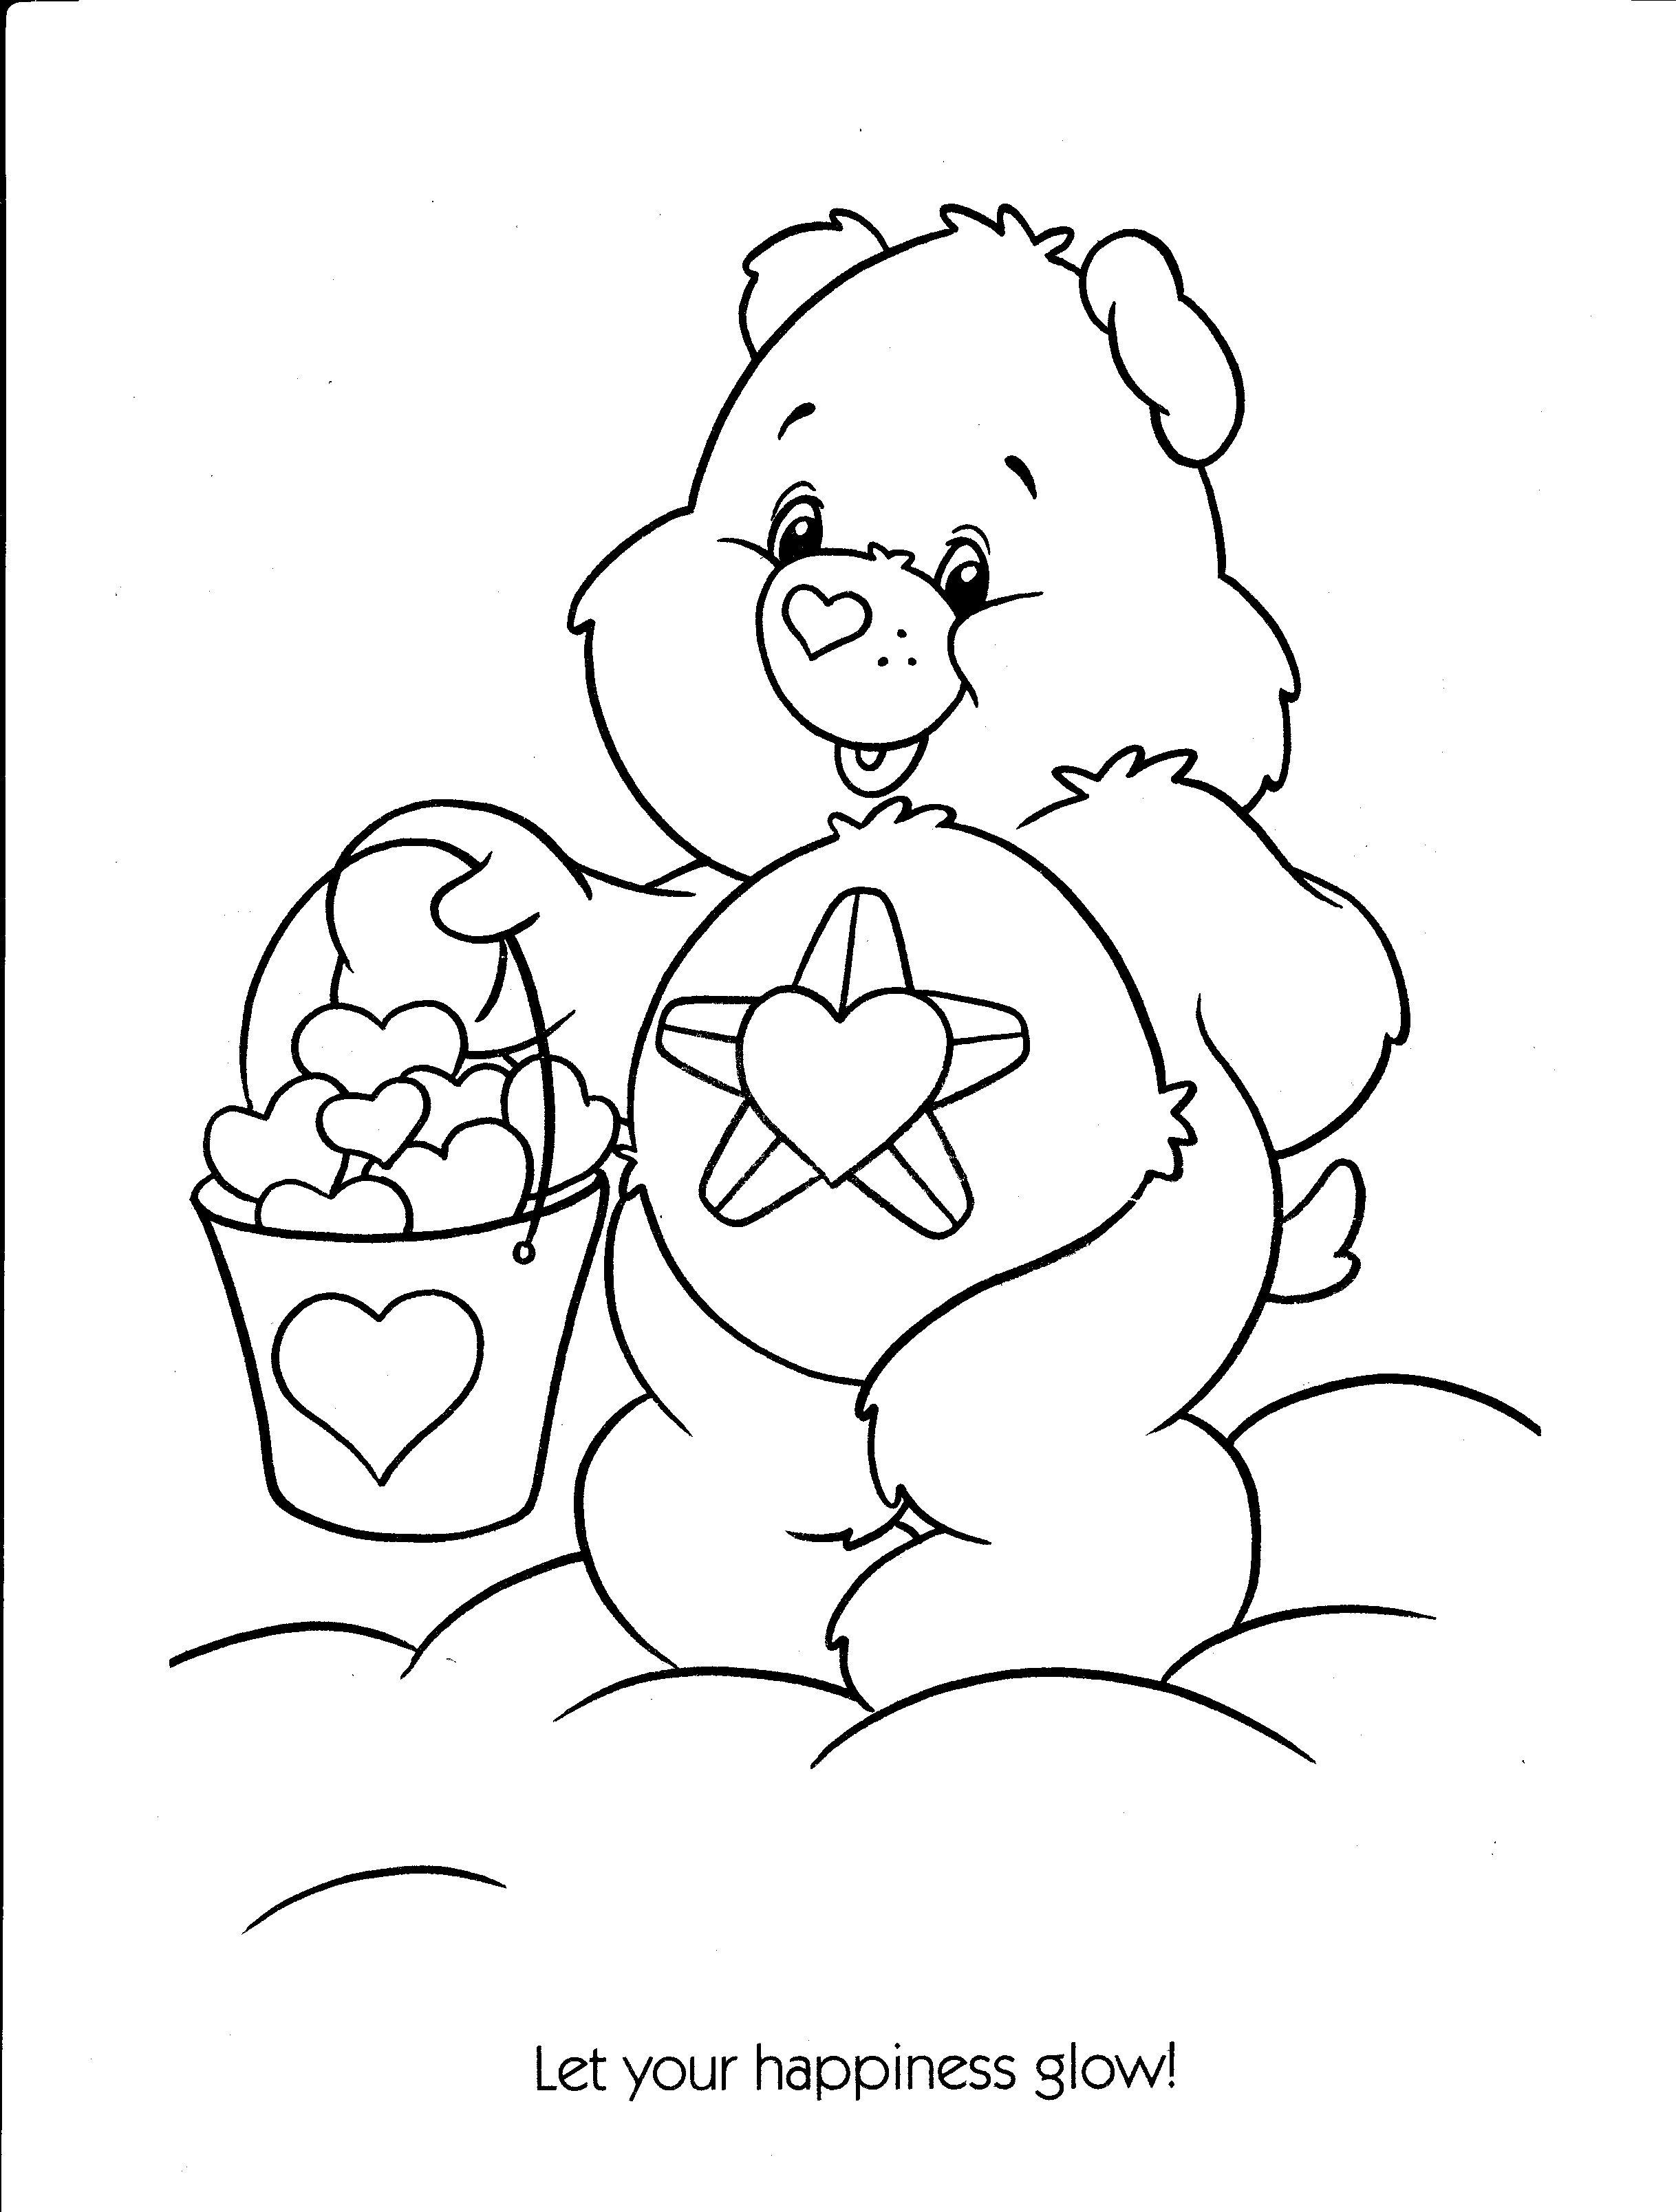 Care Bear Coloring Page Imageseldiariodelasvocesrobadas Coloring